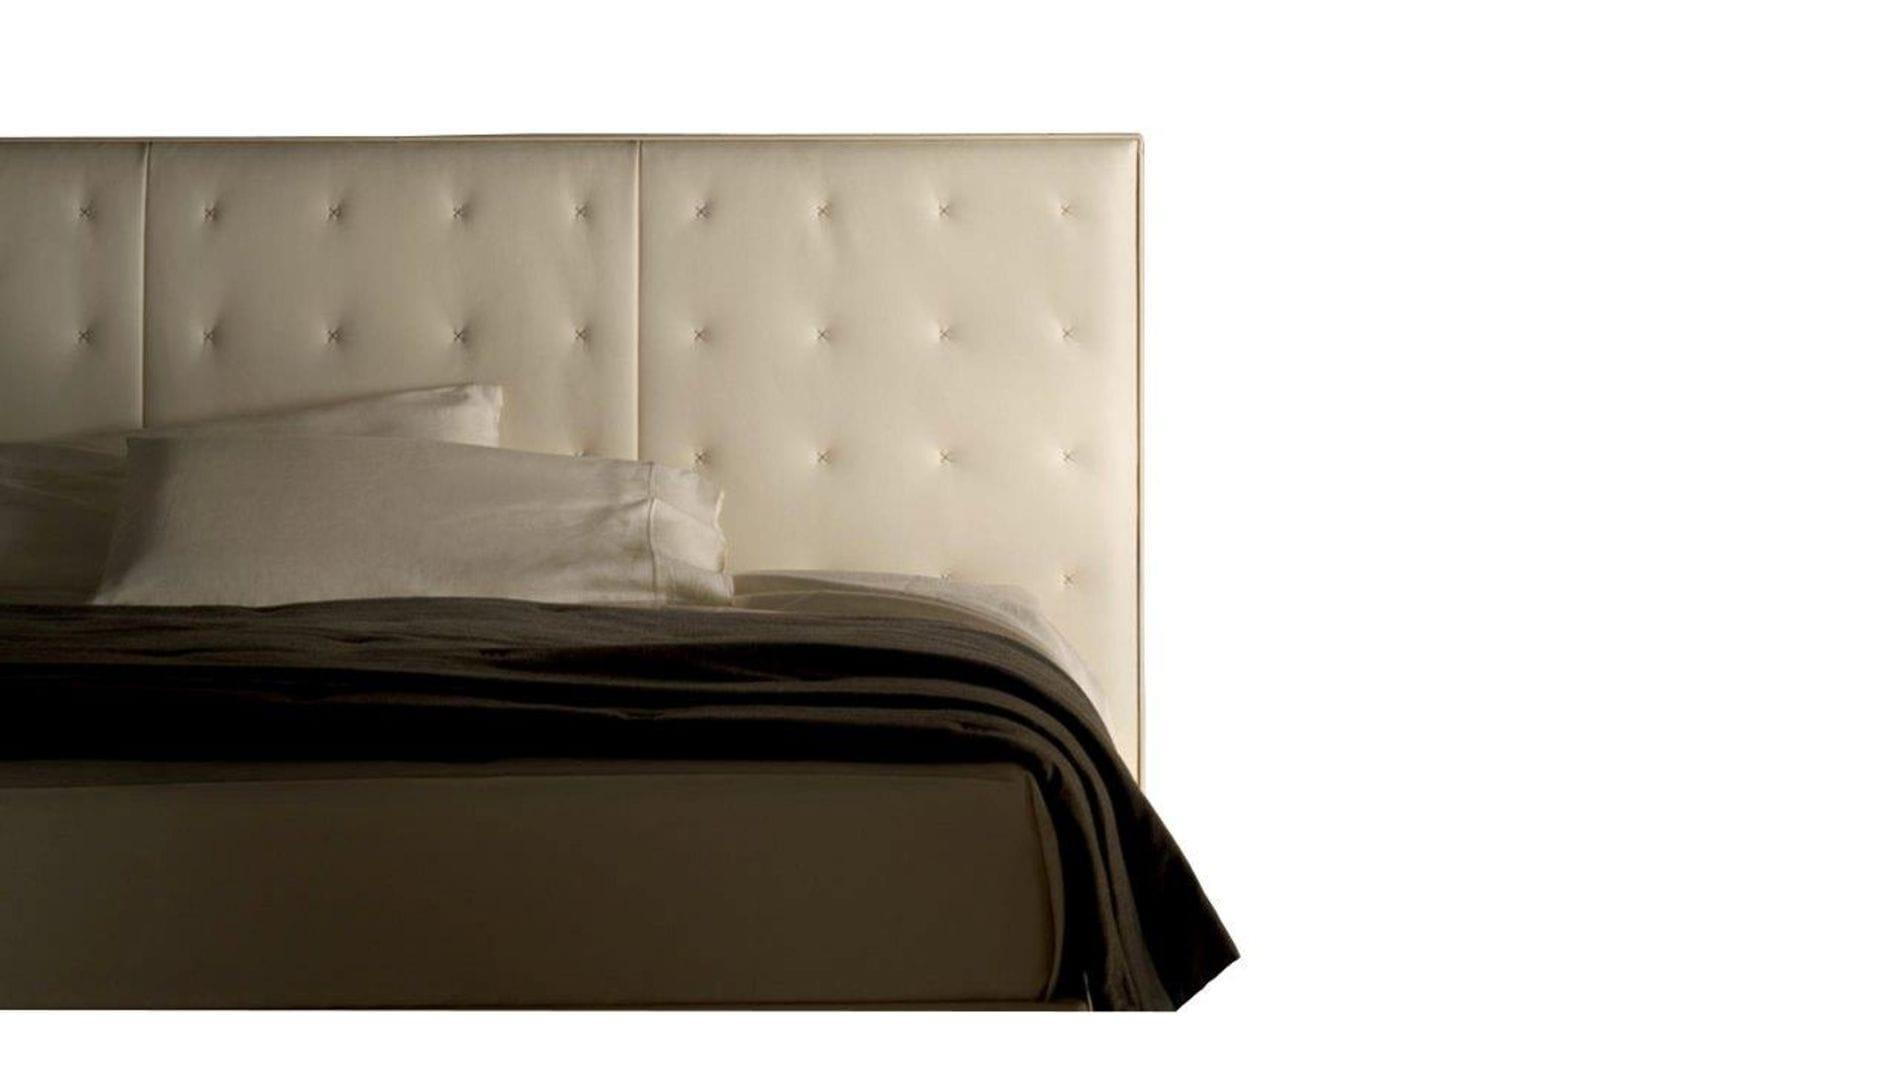 Кровать Knoff Milky Premium Leather